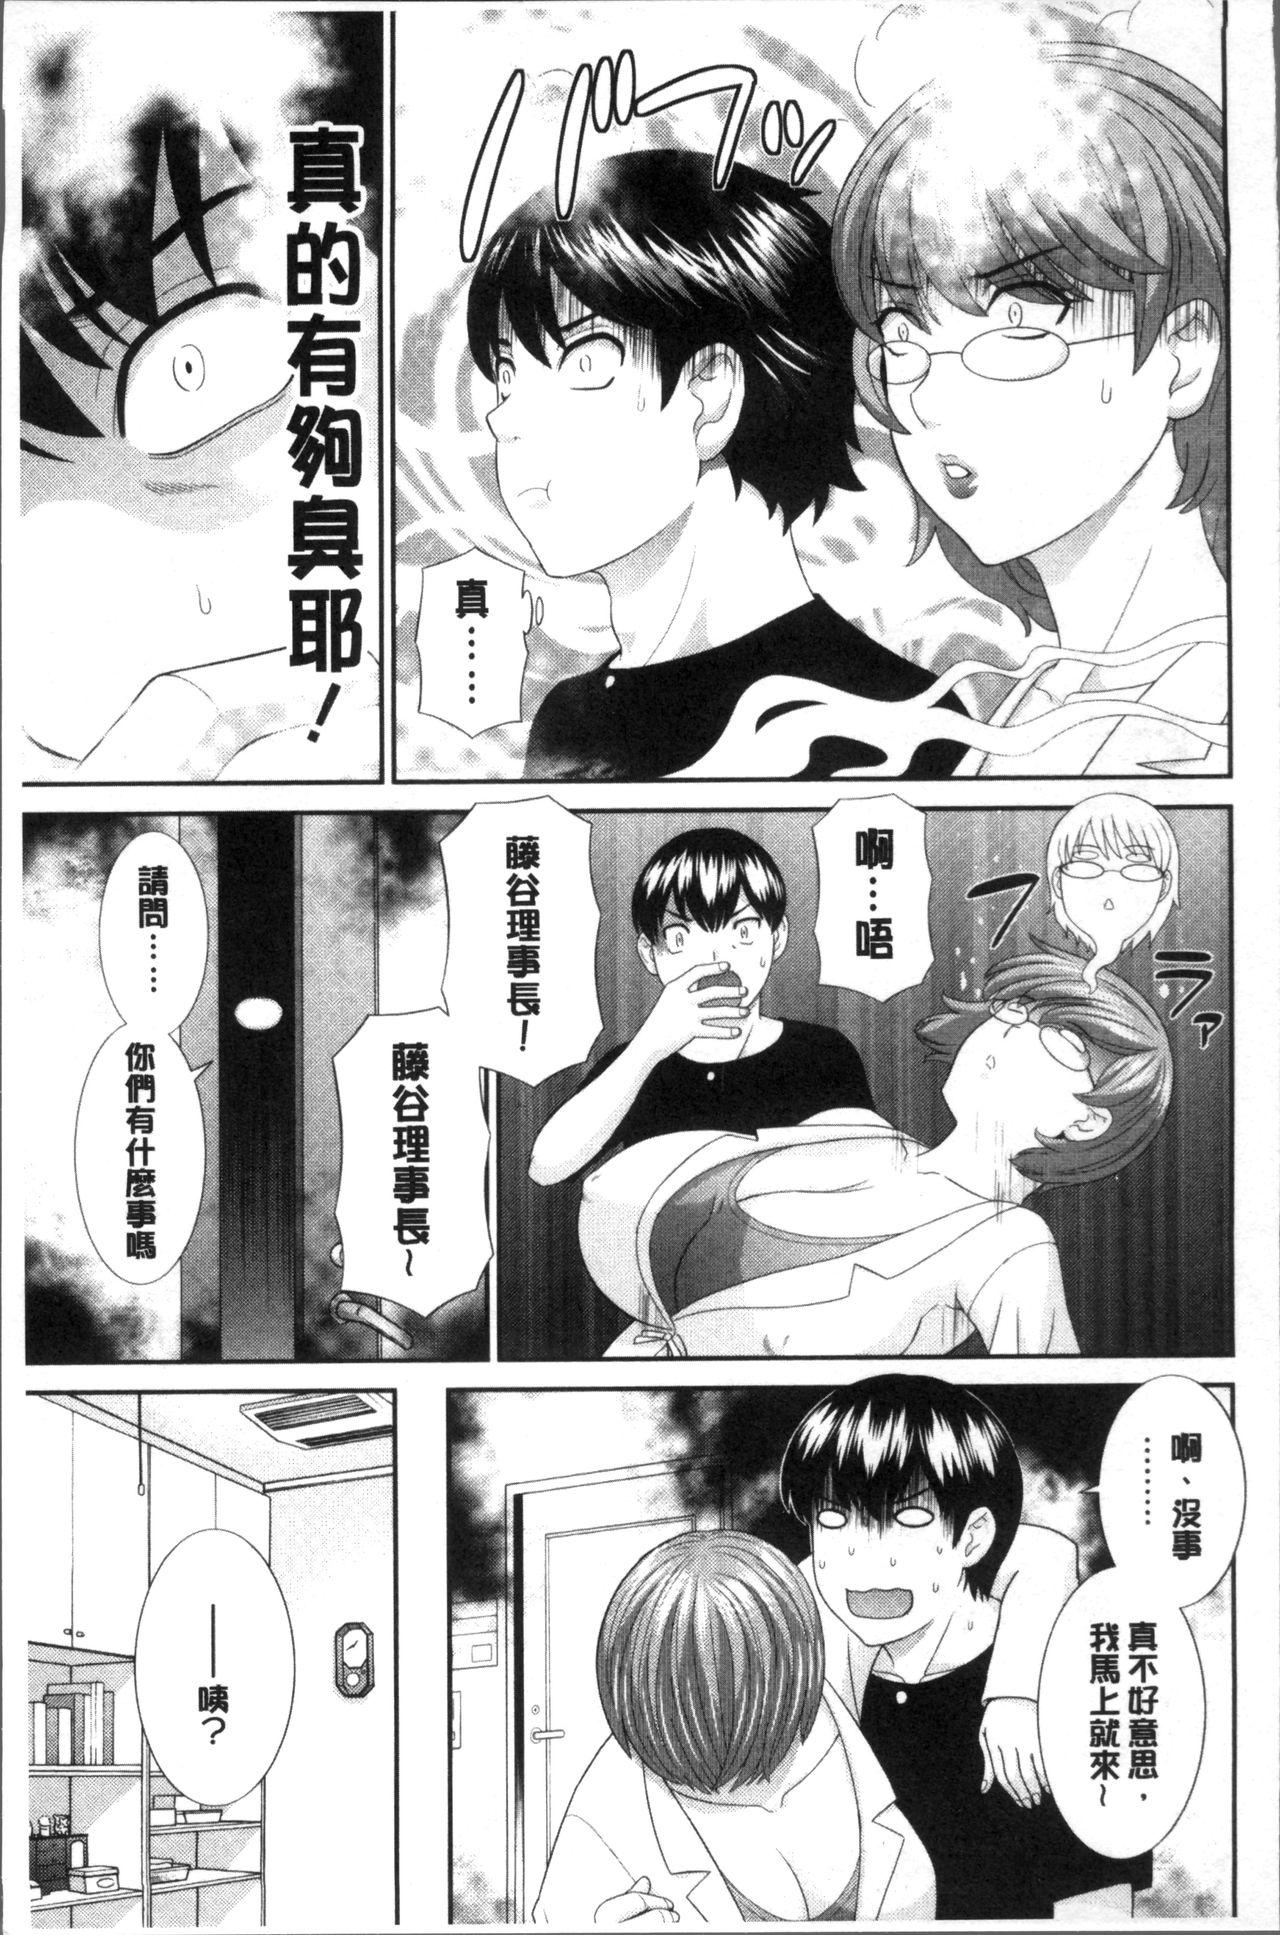 [Kawamori Misaki] Innyuu Shufu no Futei Ganbou - Oku-san to Kanojo to 2 | 淫乳主婦的不貞願望 和人妻也和女友❤2 [Chinese] 28